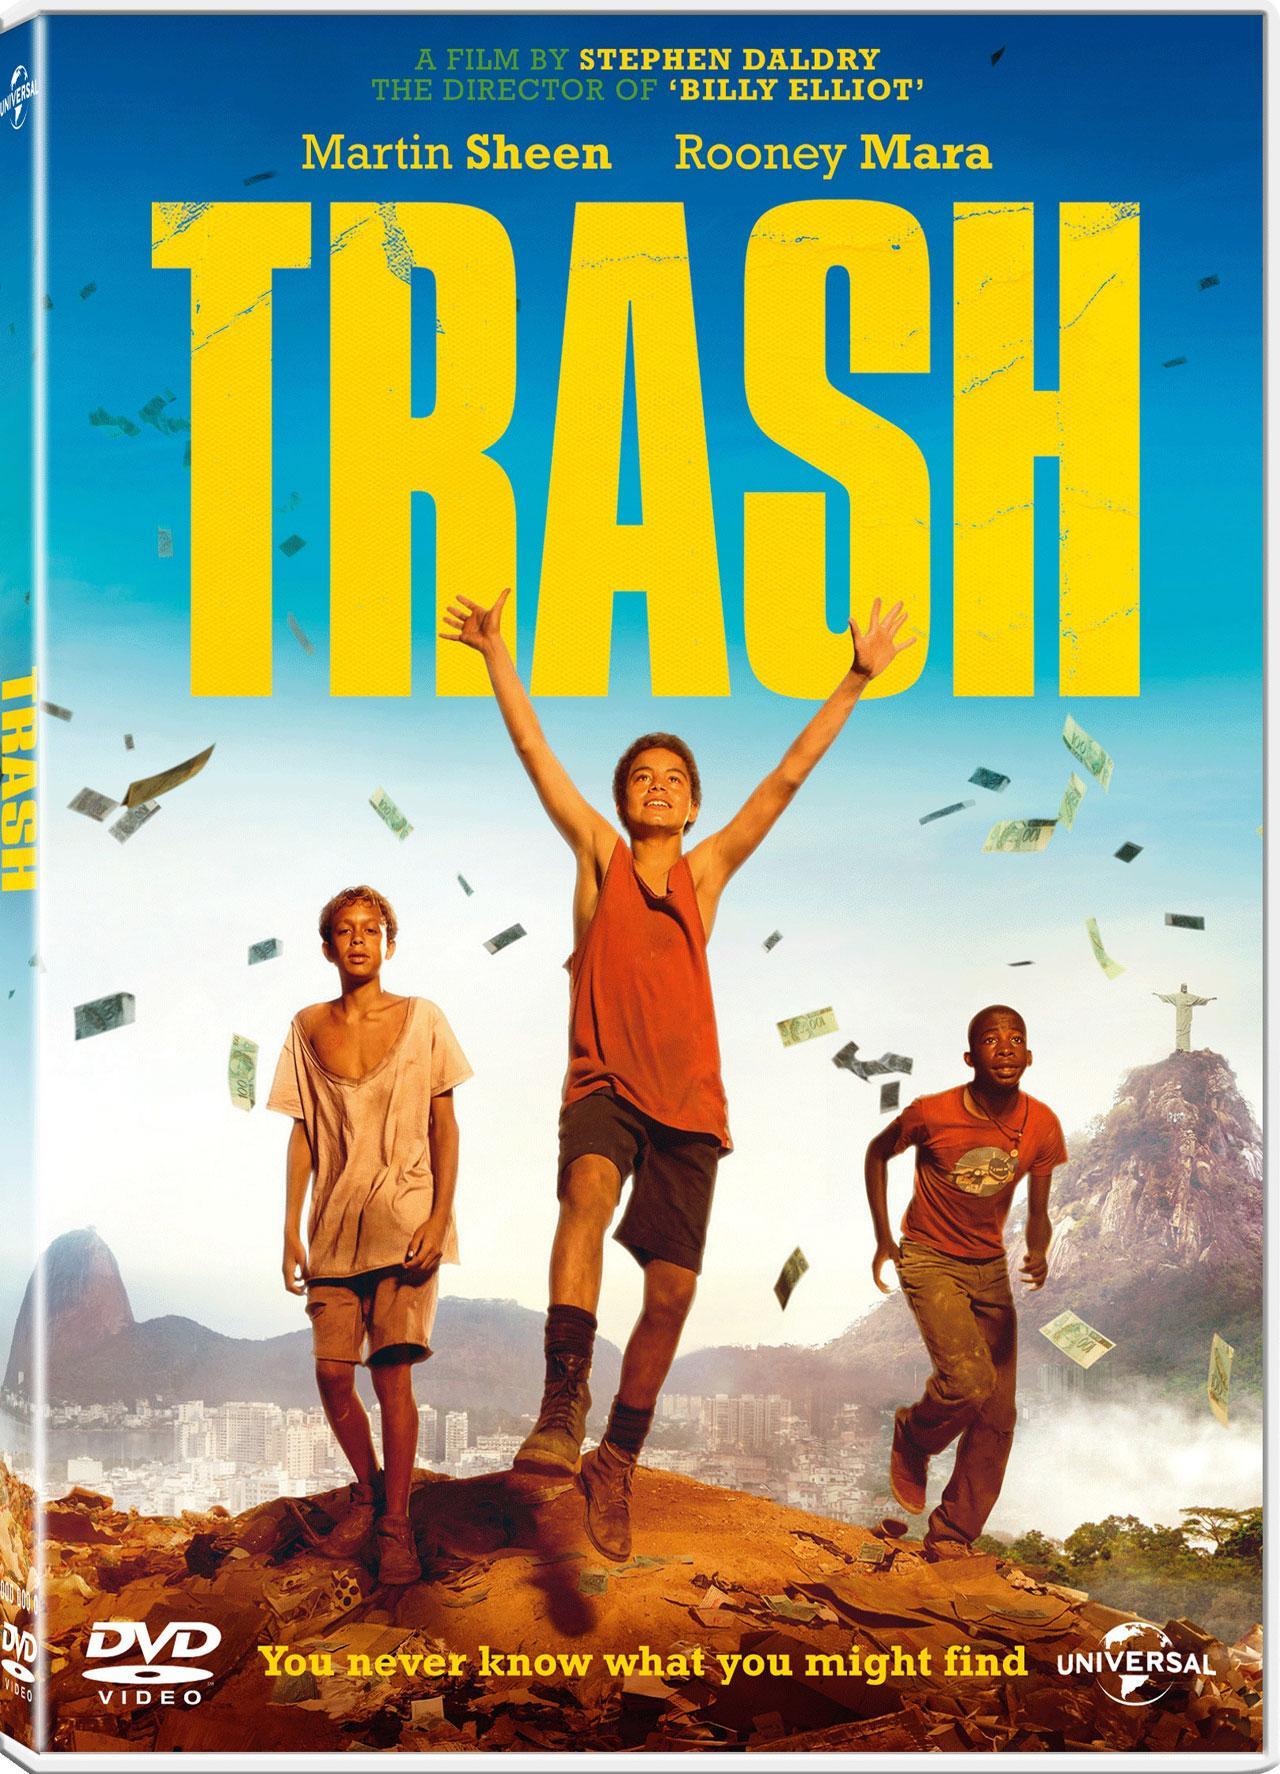 Trash : แทรช พลิกชะตาคว้าฝัน